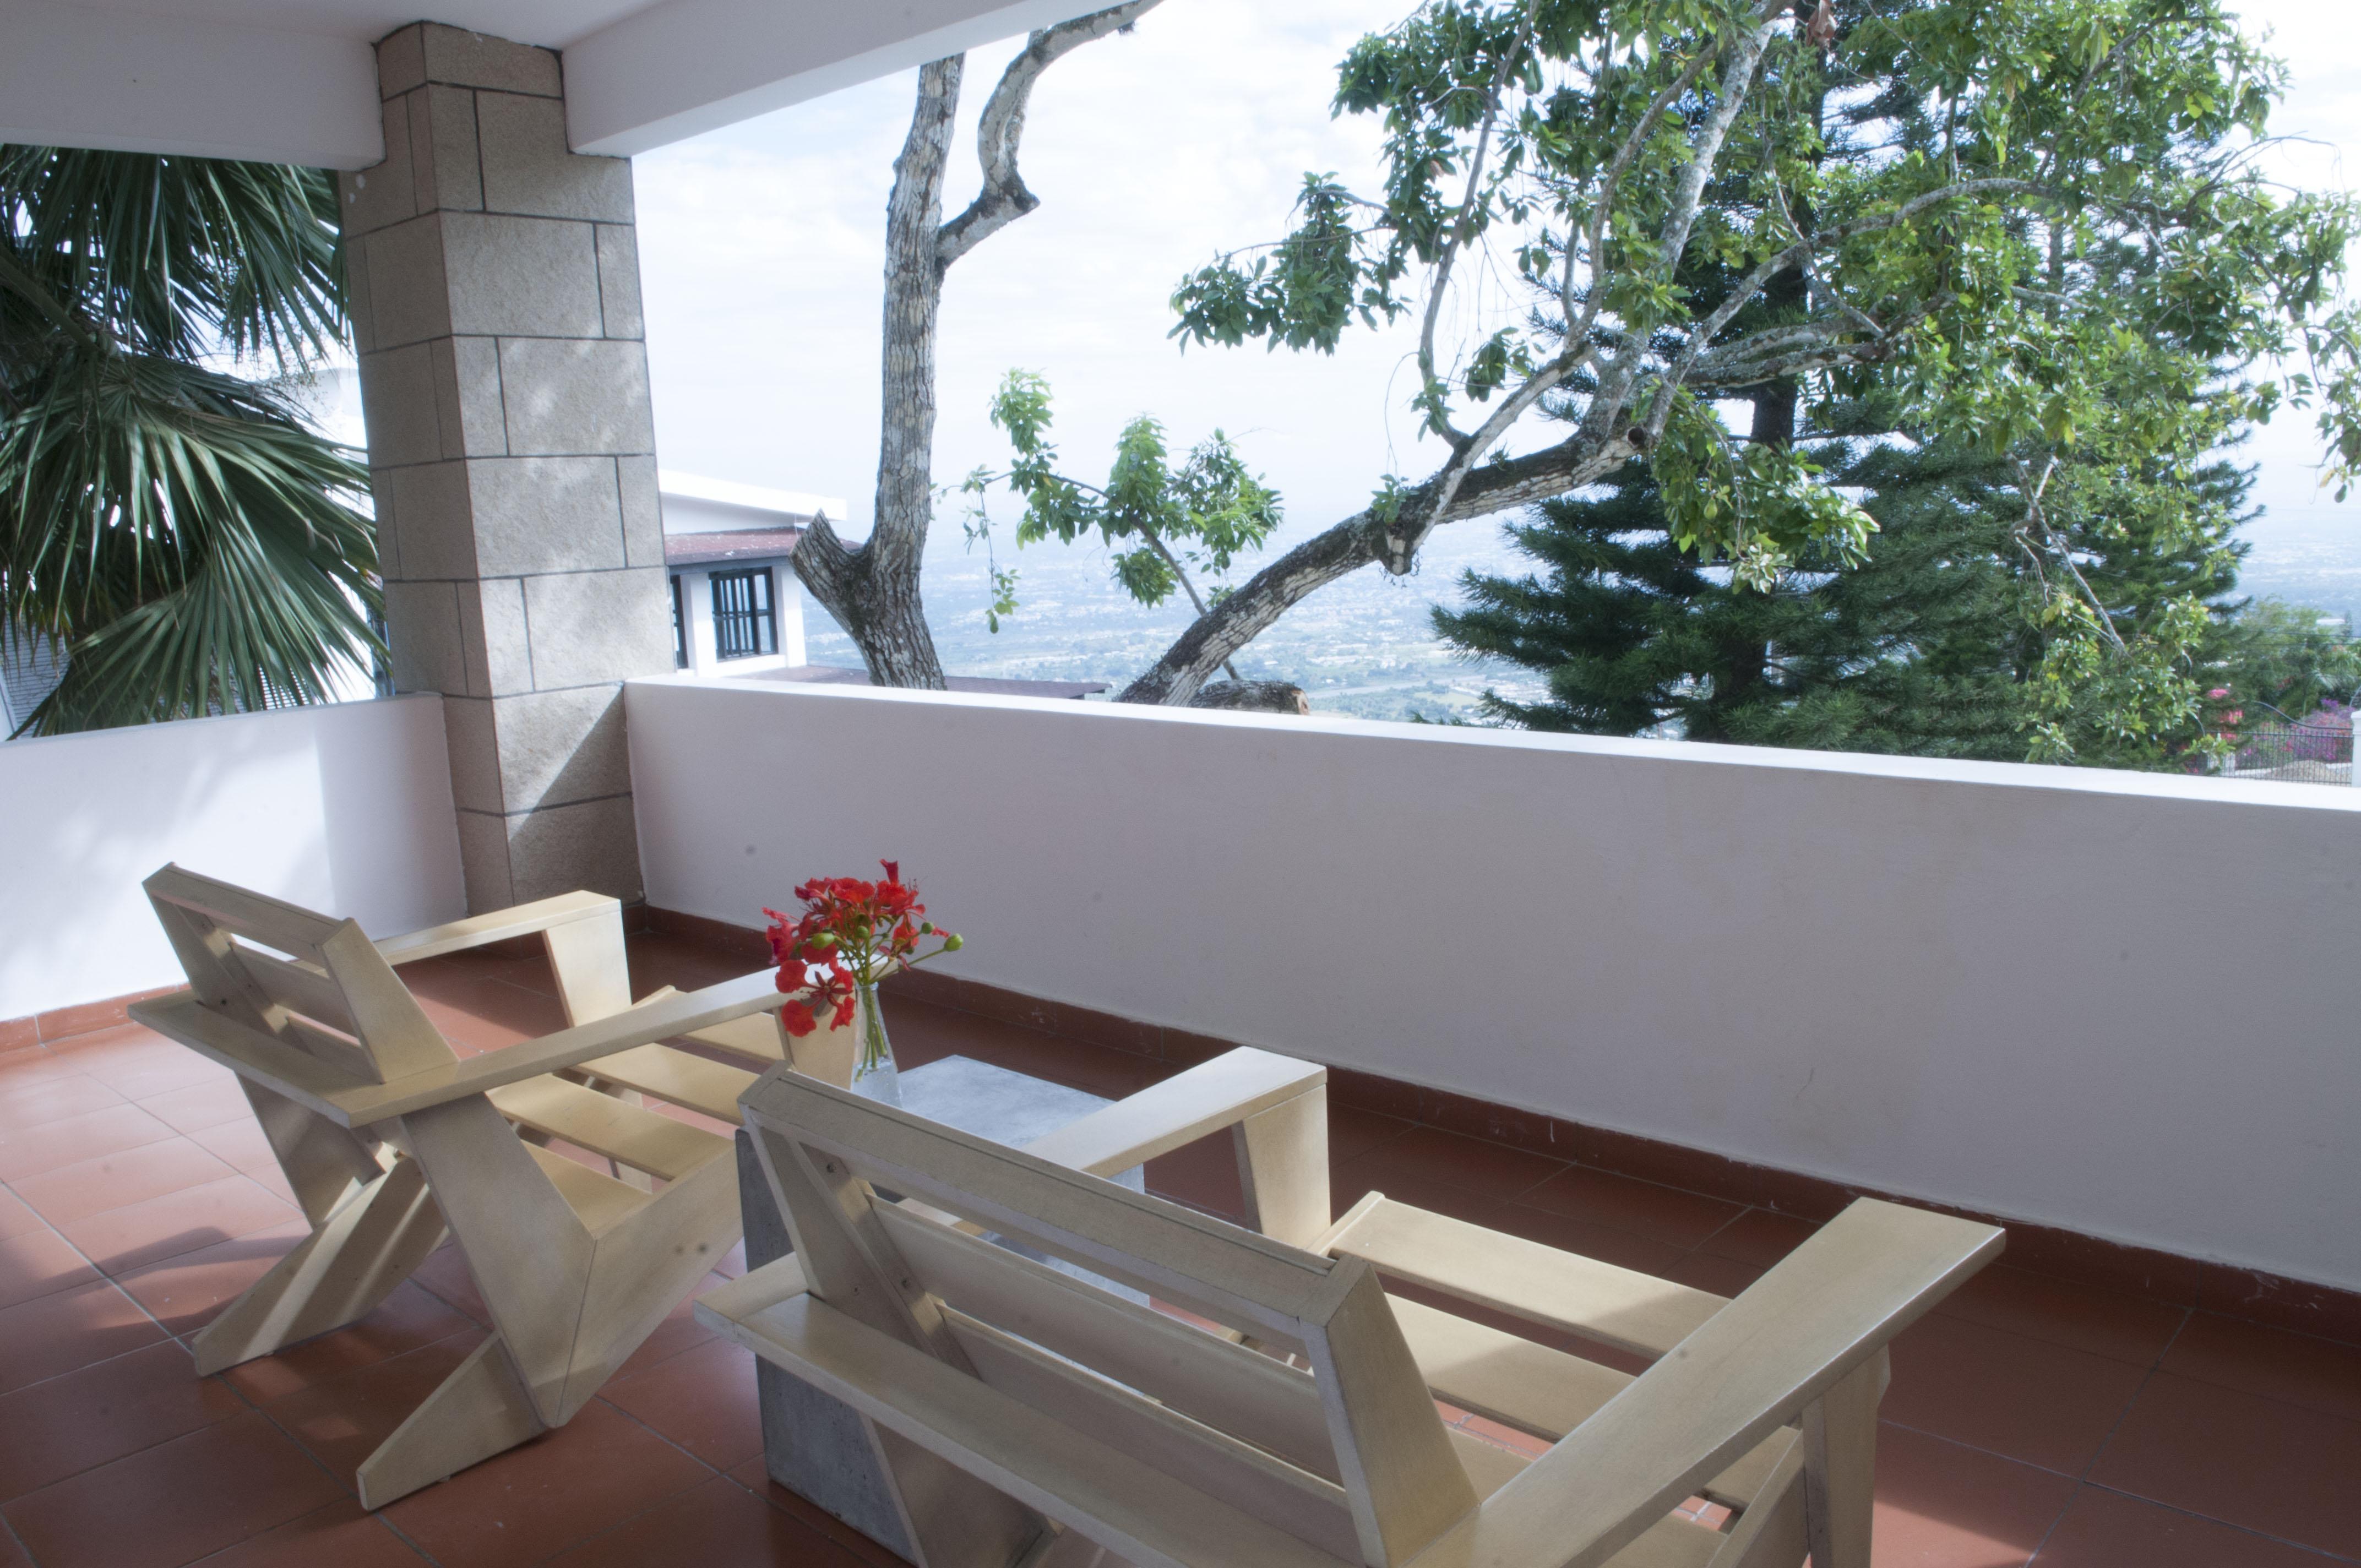 Balcony daylight